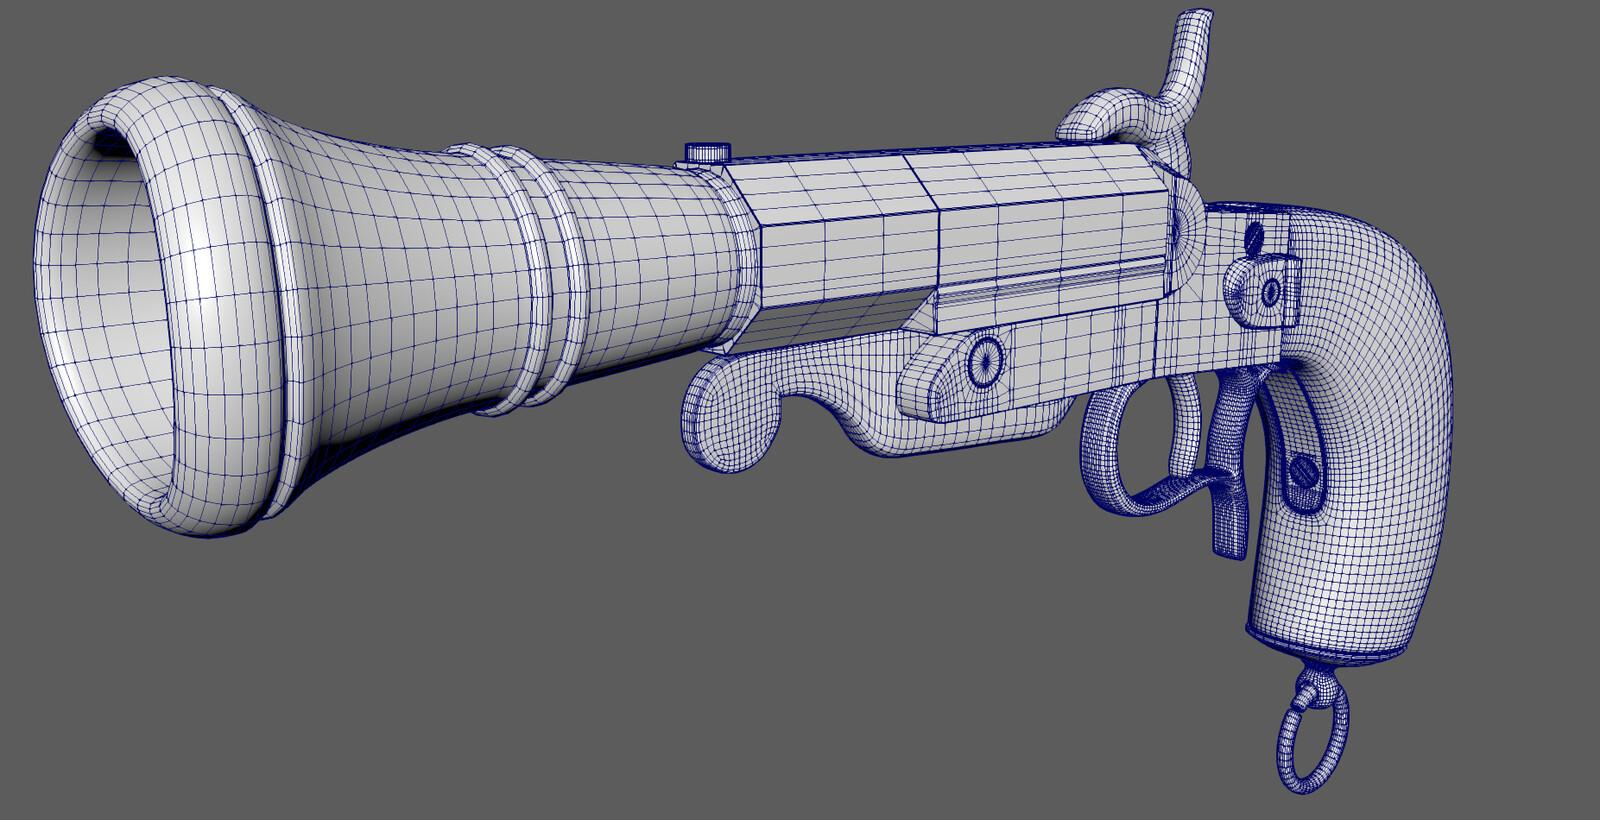 A Blunderbuss pistol model I created in Maya 2019. Maybe a little too dense...